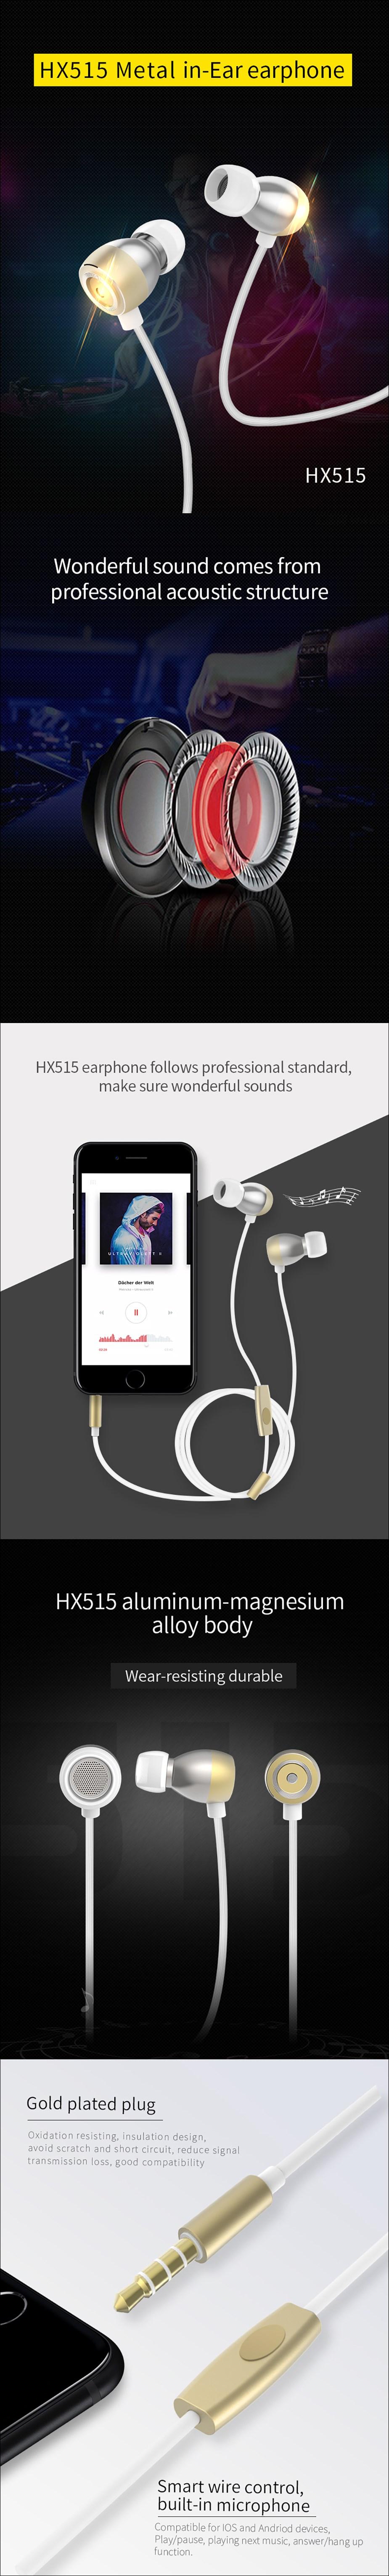 XiPin HX515 In-Ear Headphones - Silver - Overview 1